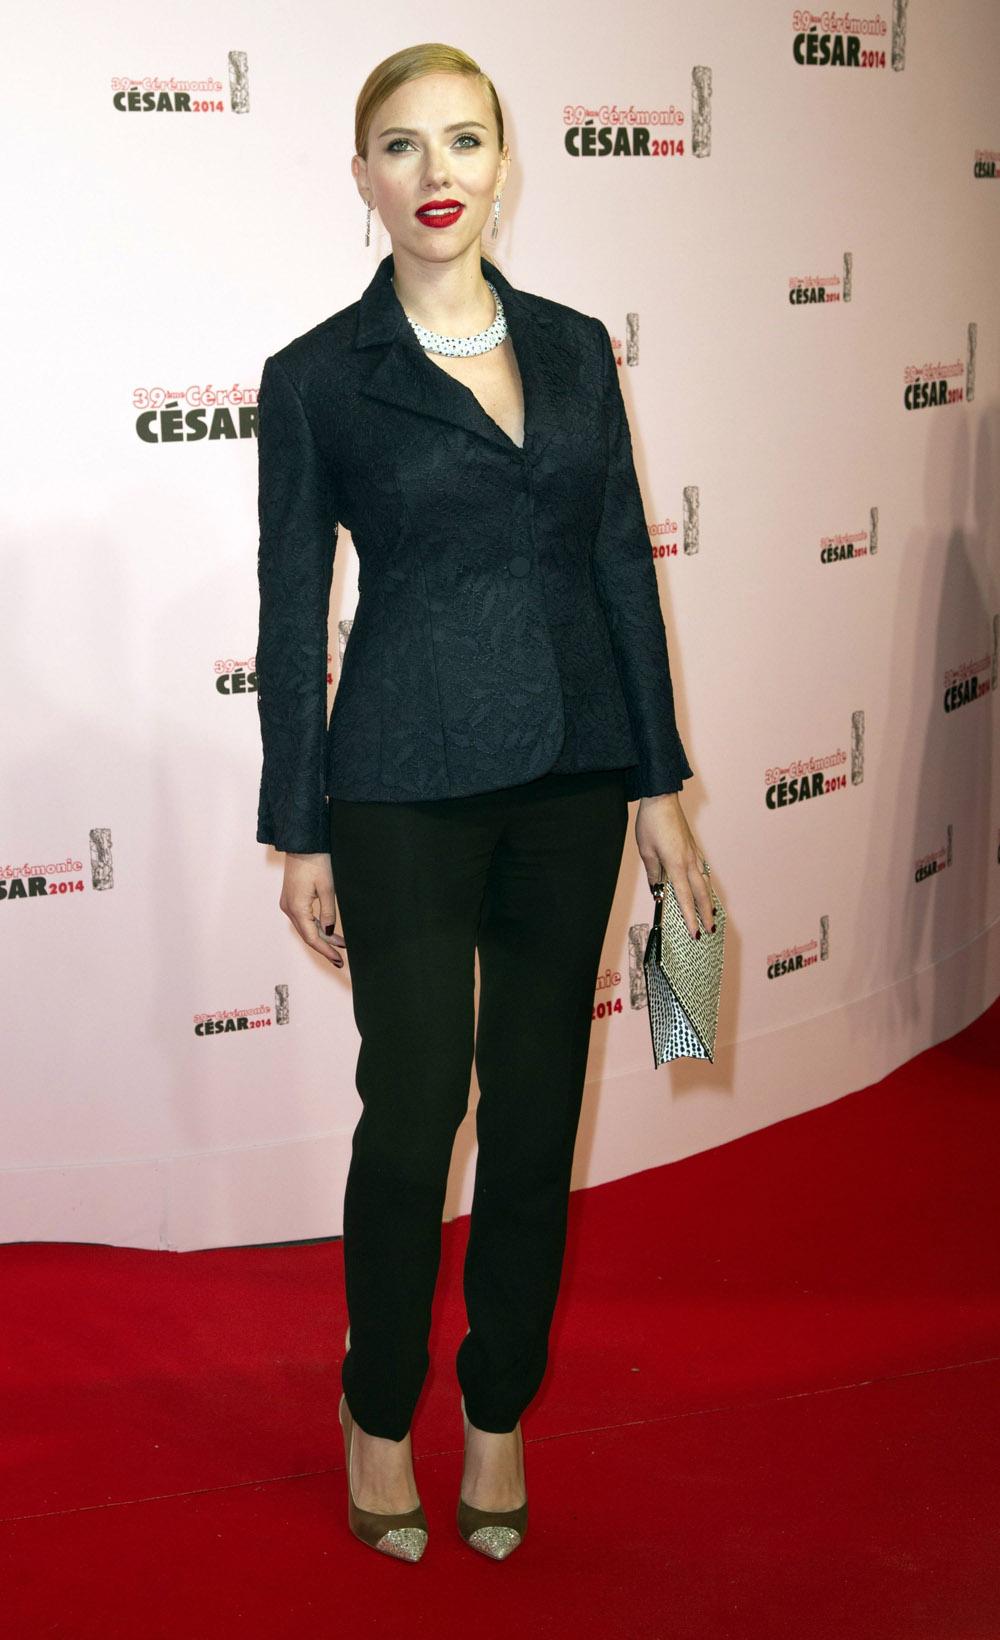 cele bitchy scarlett johansson in a dior pantsuit at the c eacute sars 39th cesar film awards